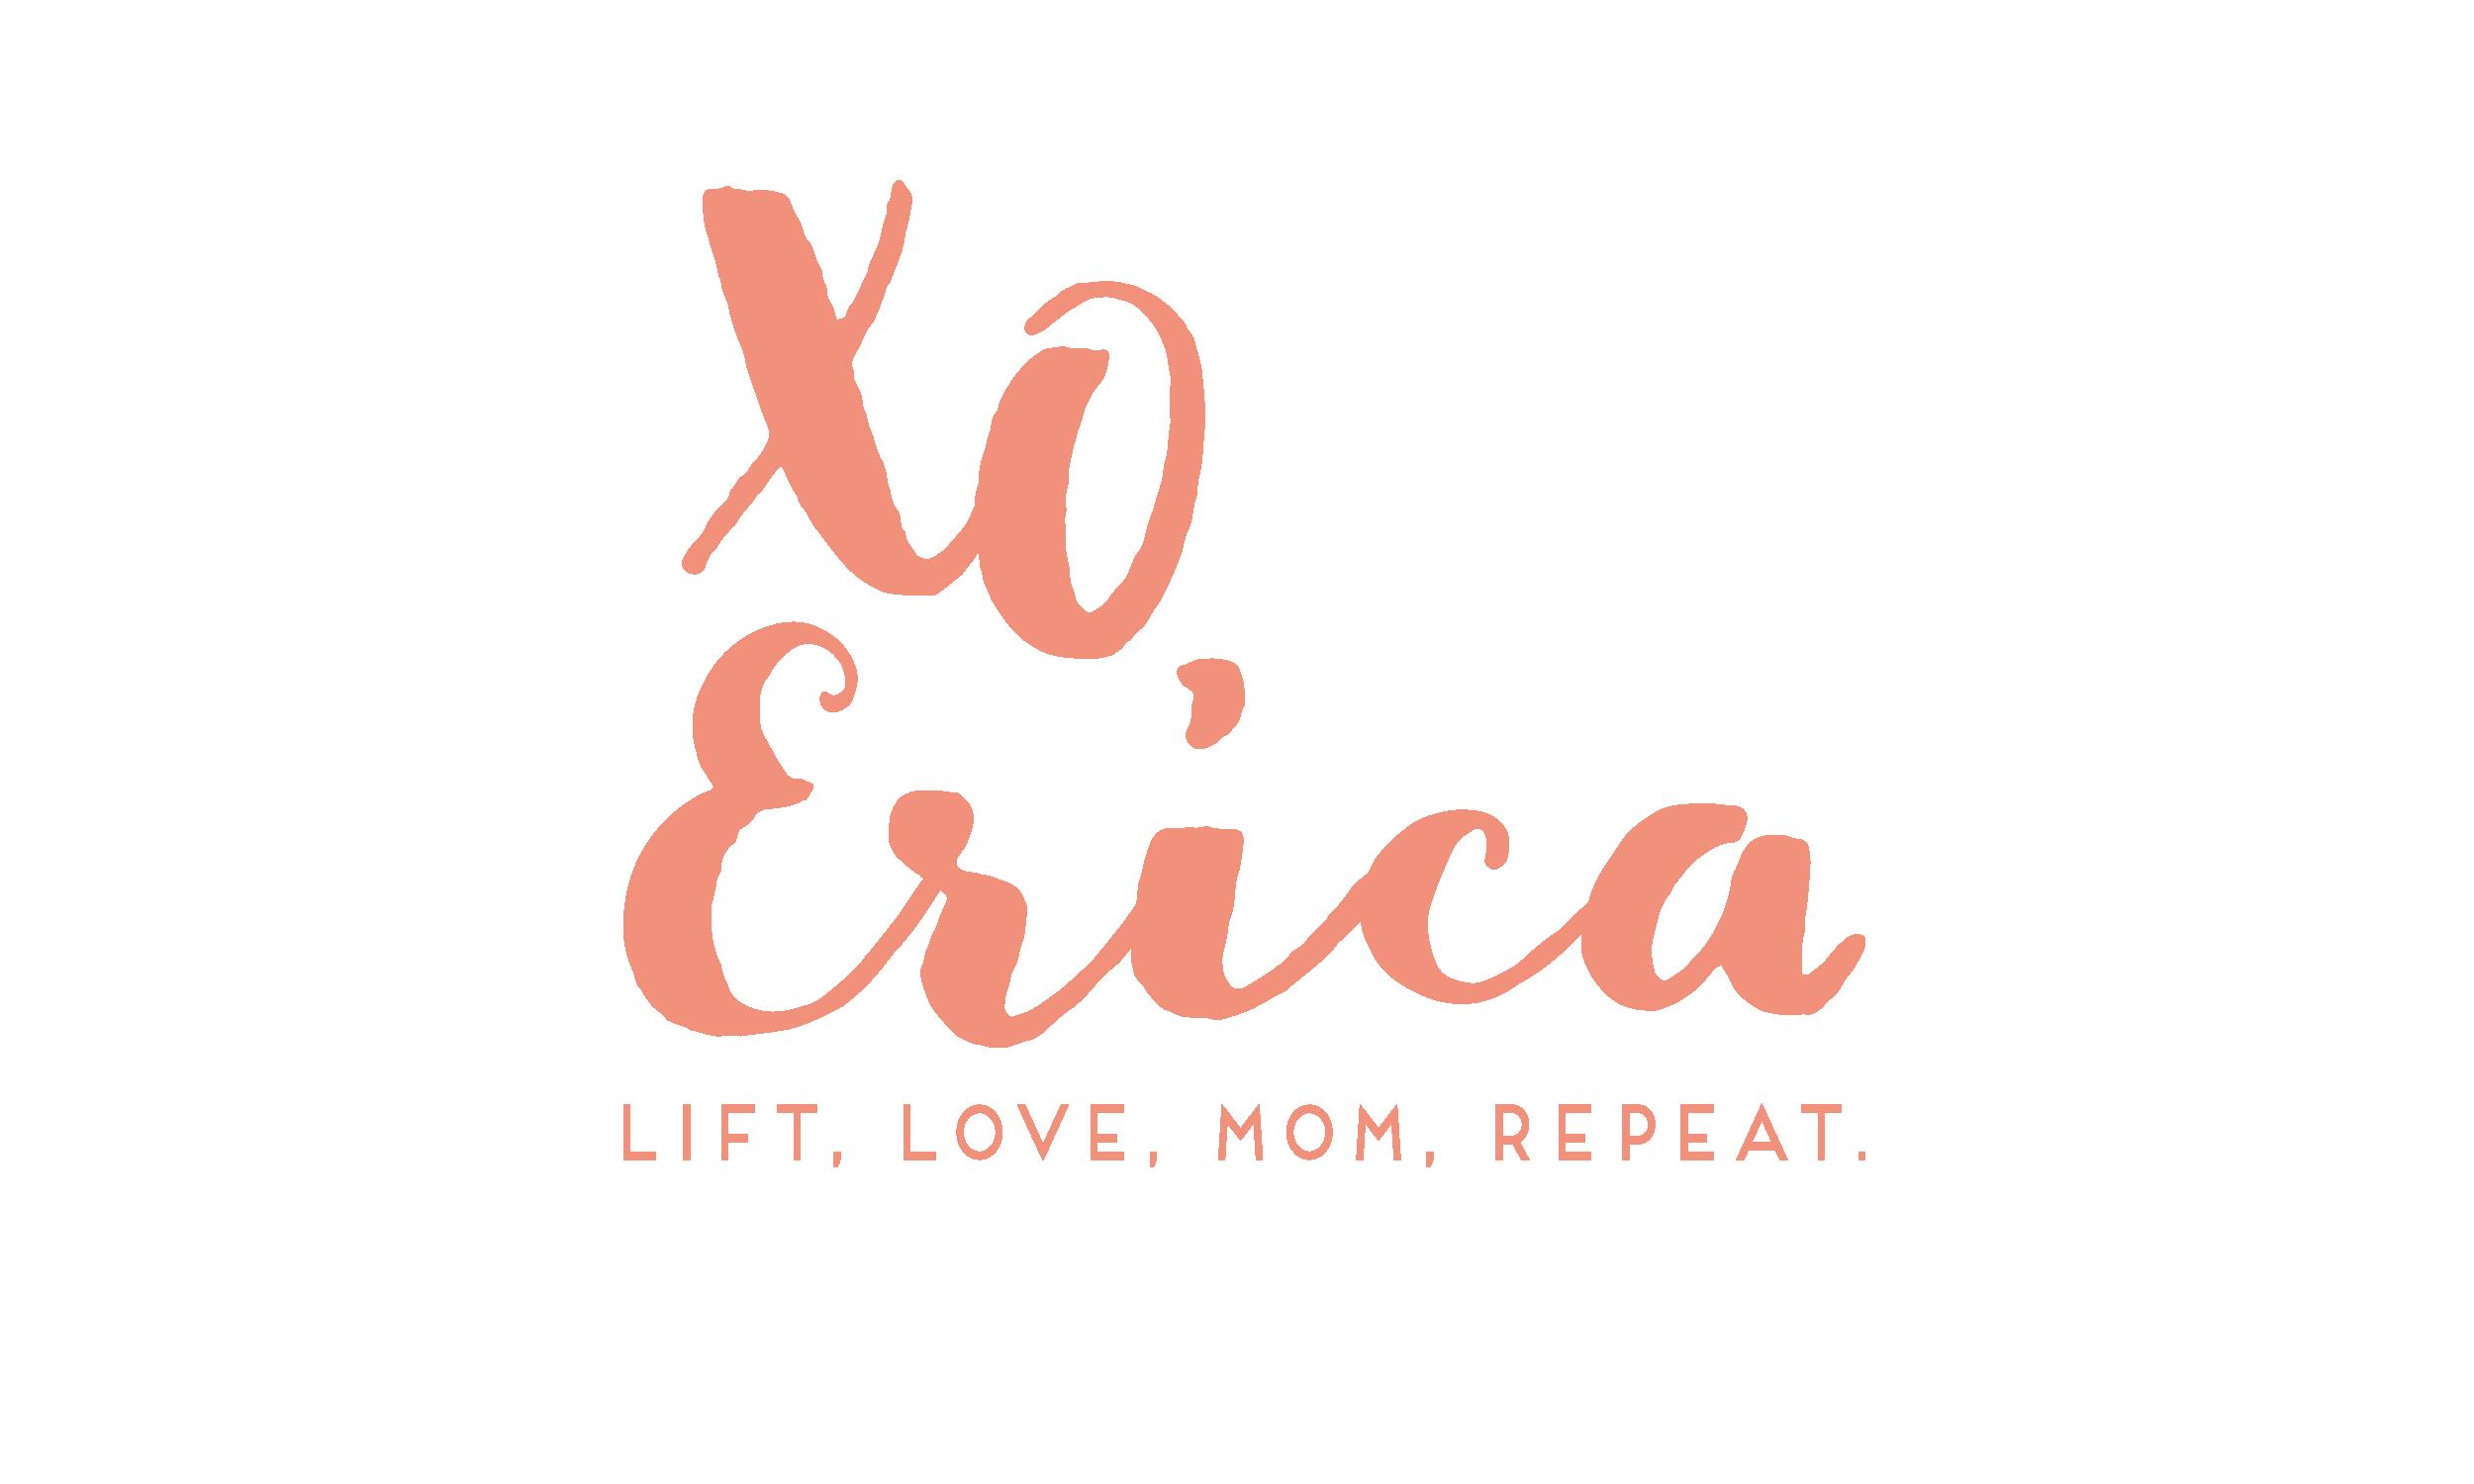 XO-Erica